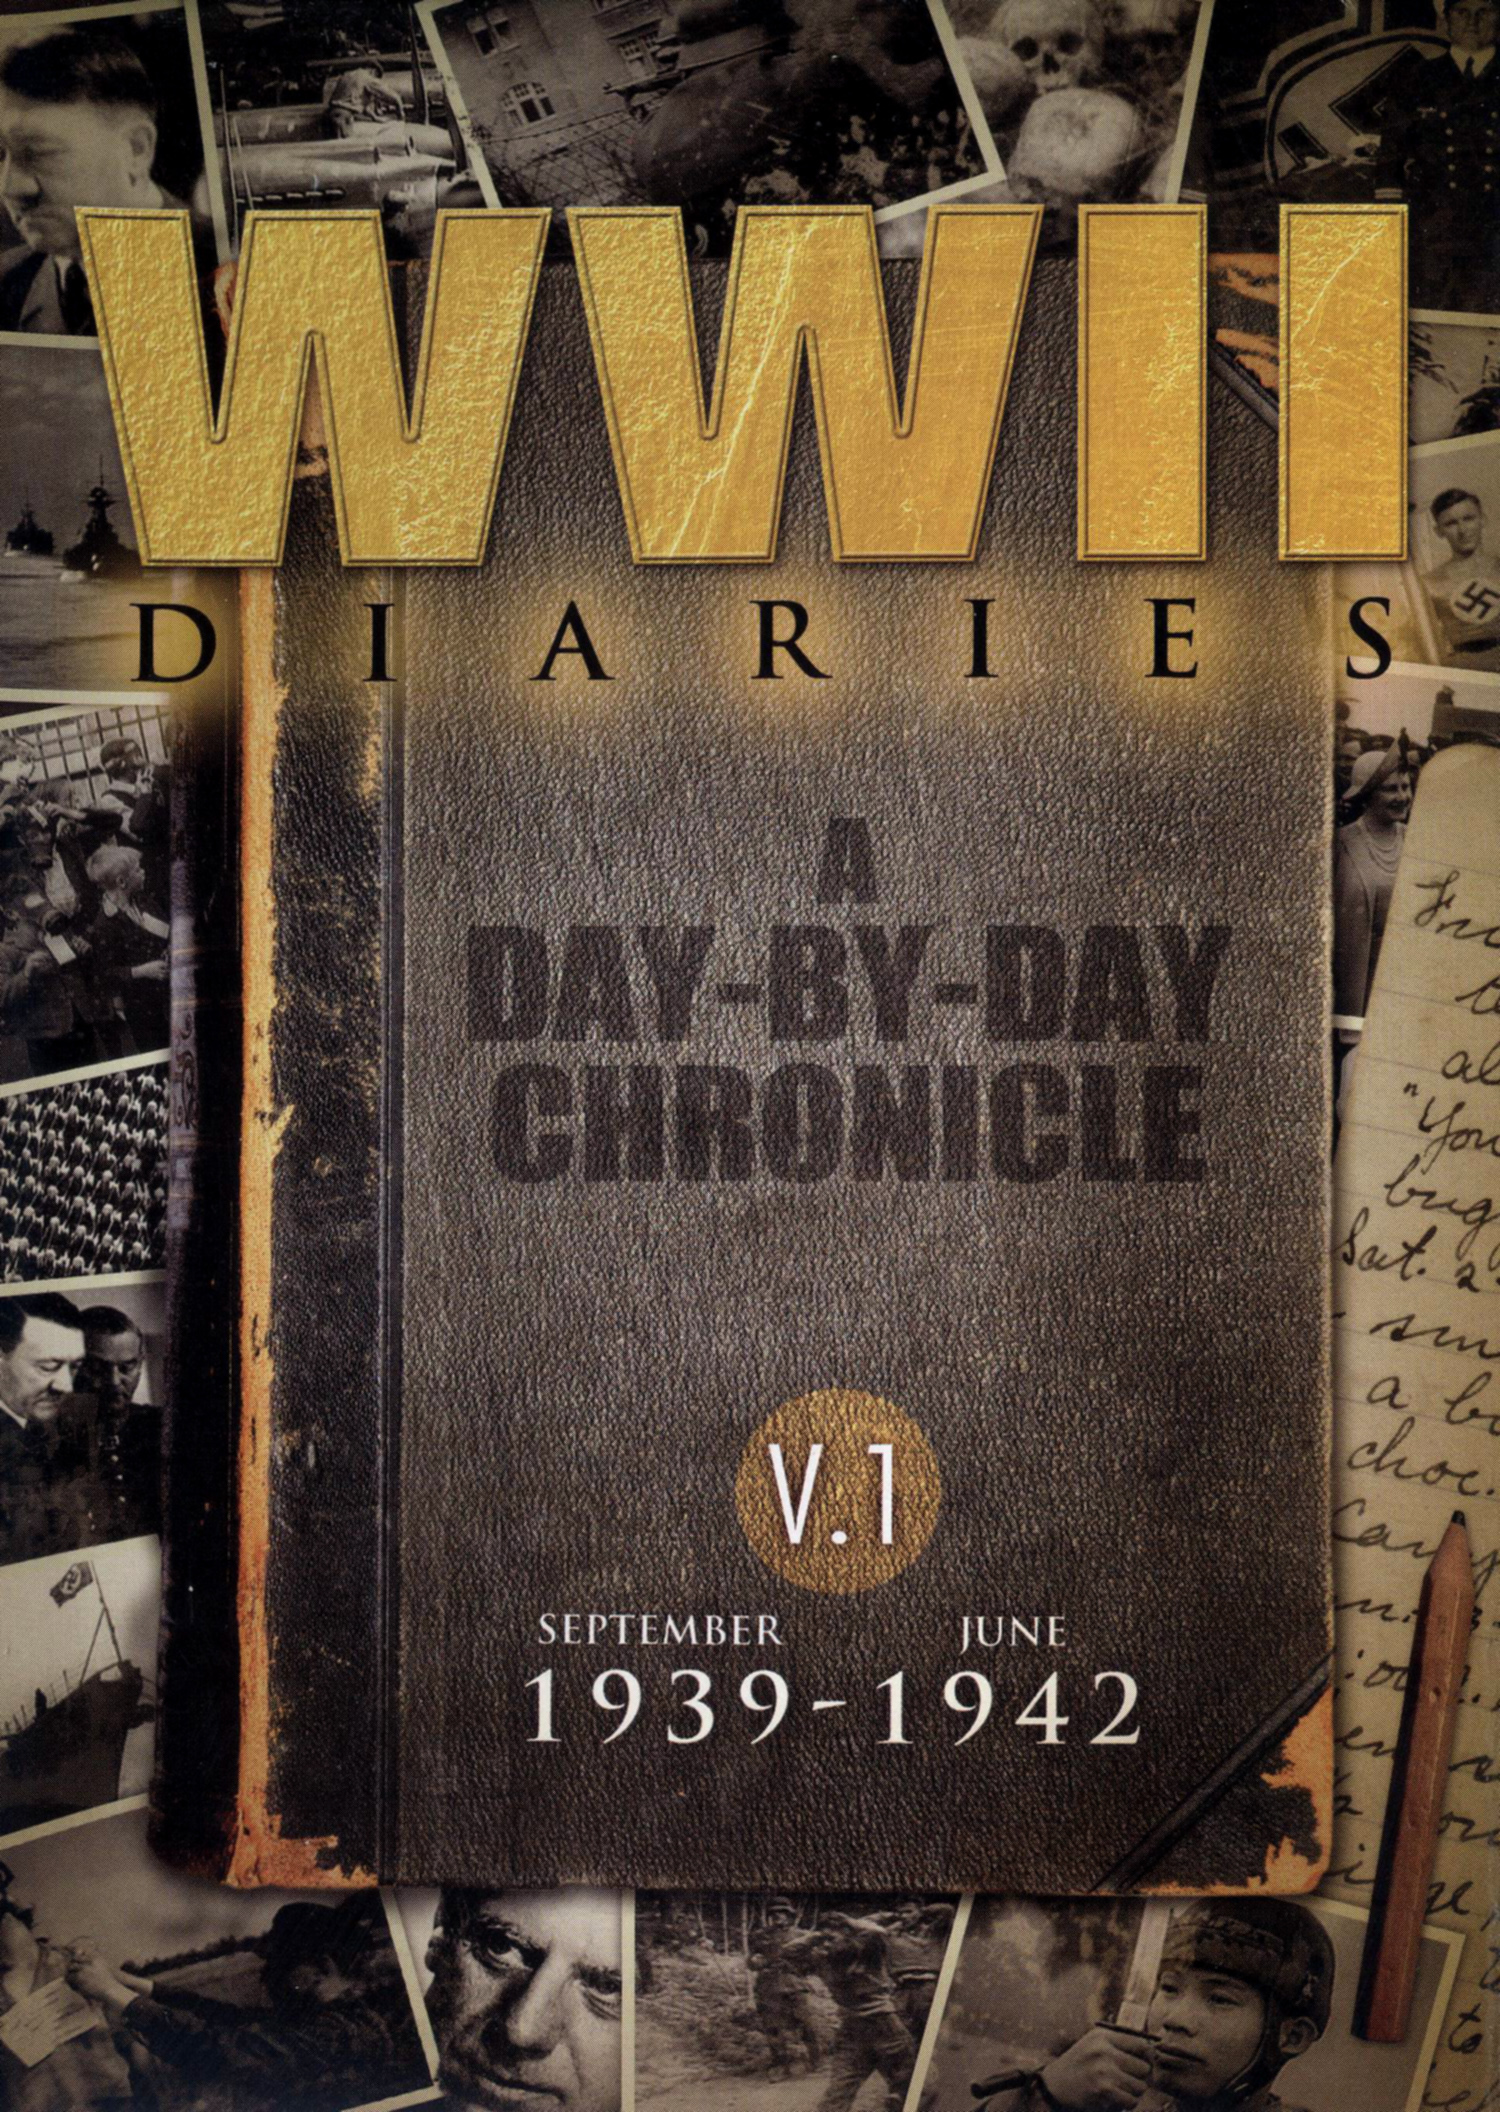 WWII Diaries, Vol. 1: September 1939-June 1942